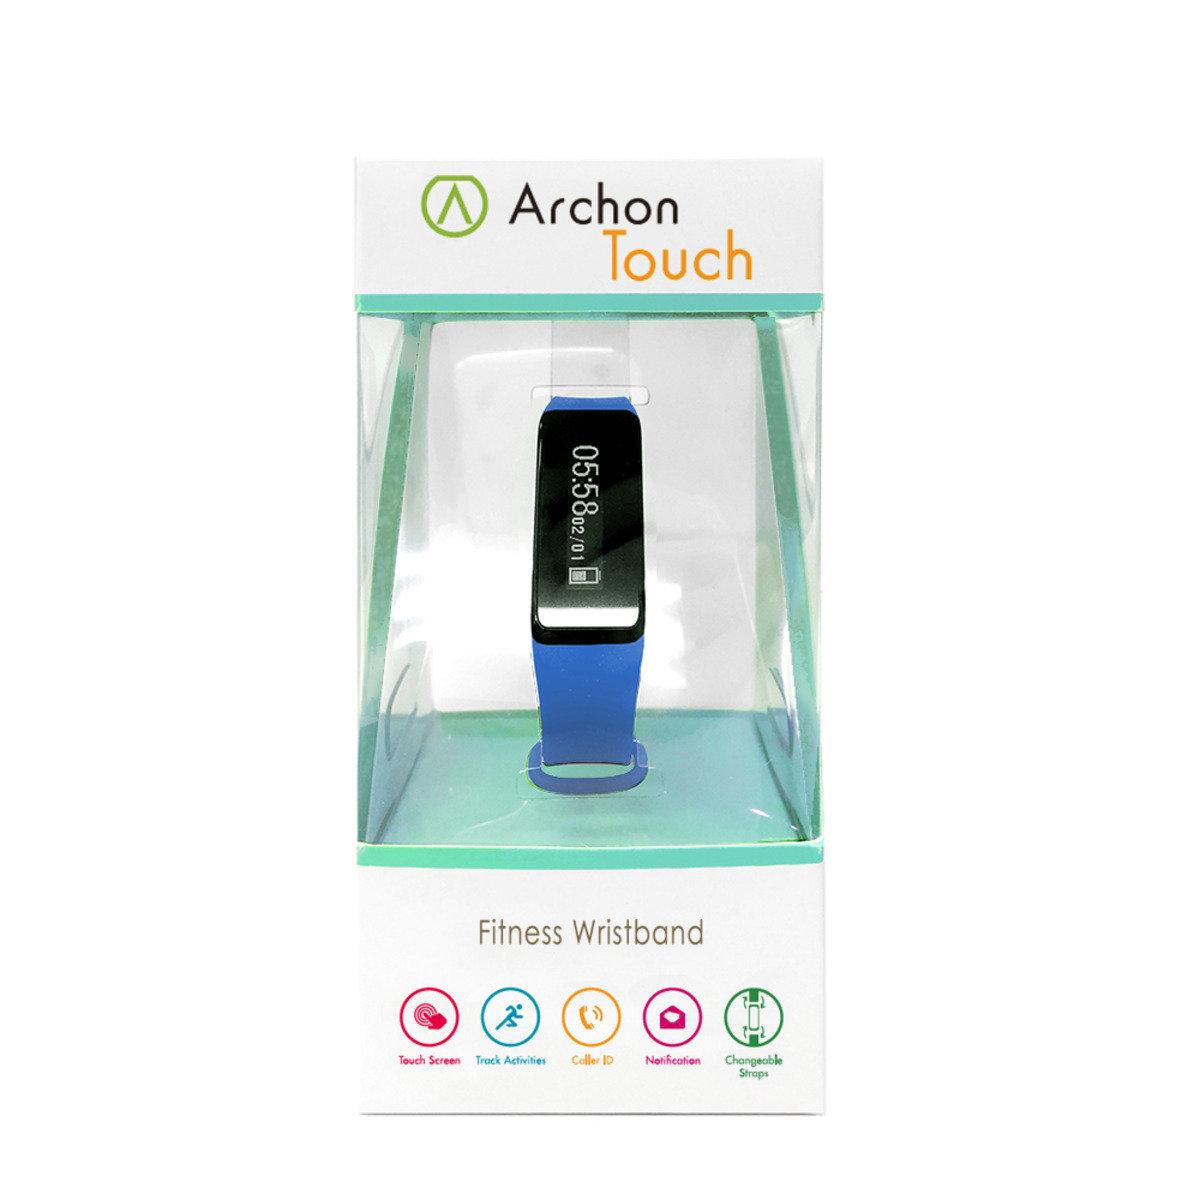 Archon Touch智能健康手環 - 藍色